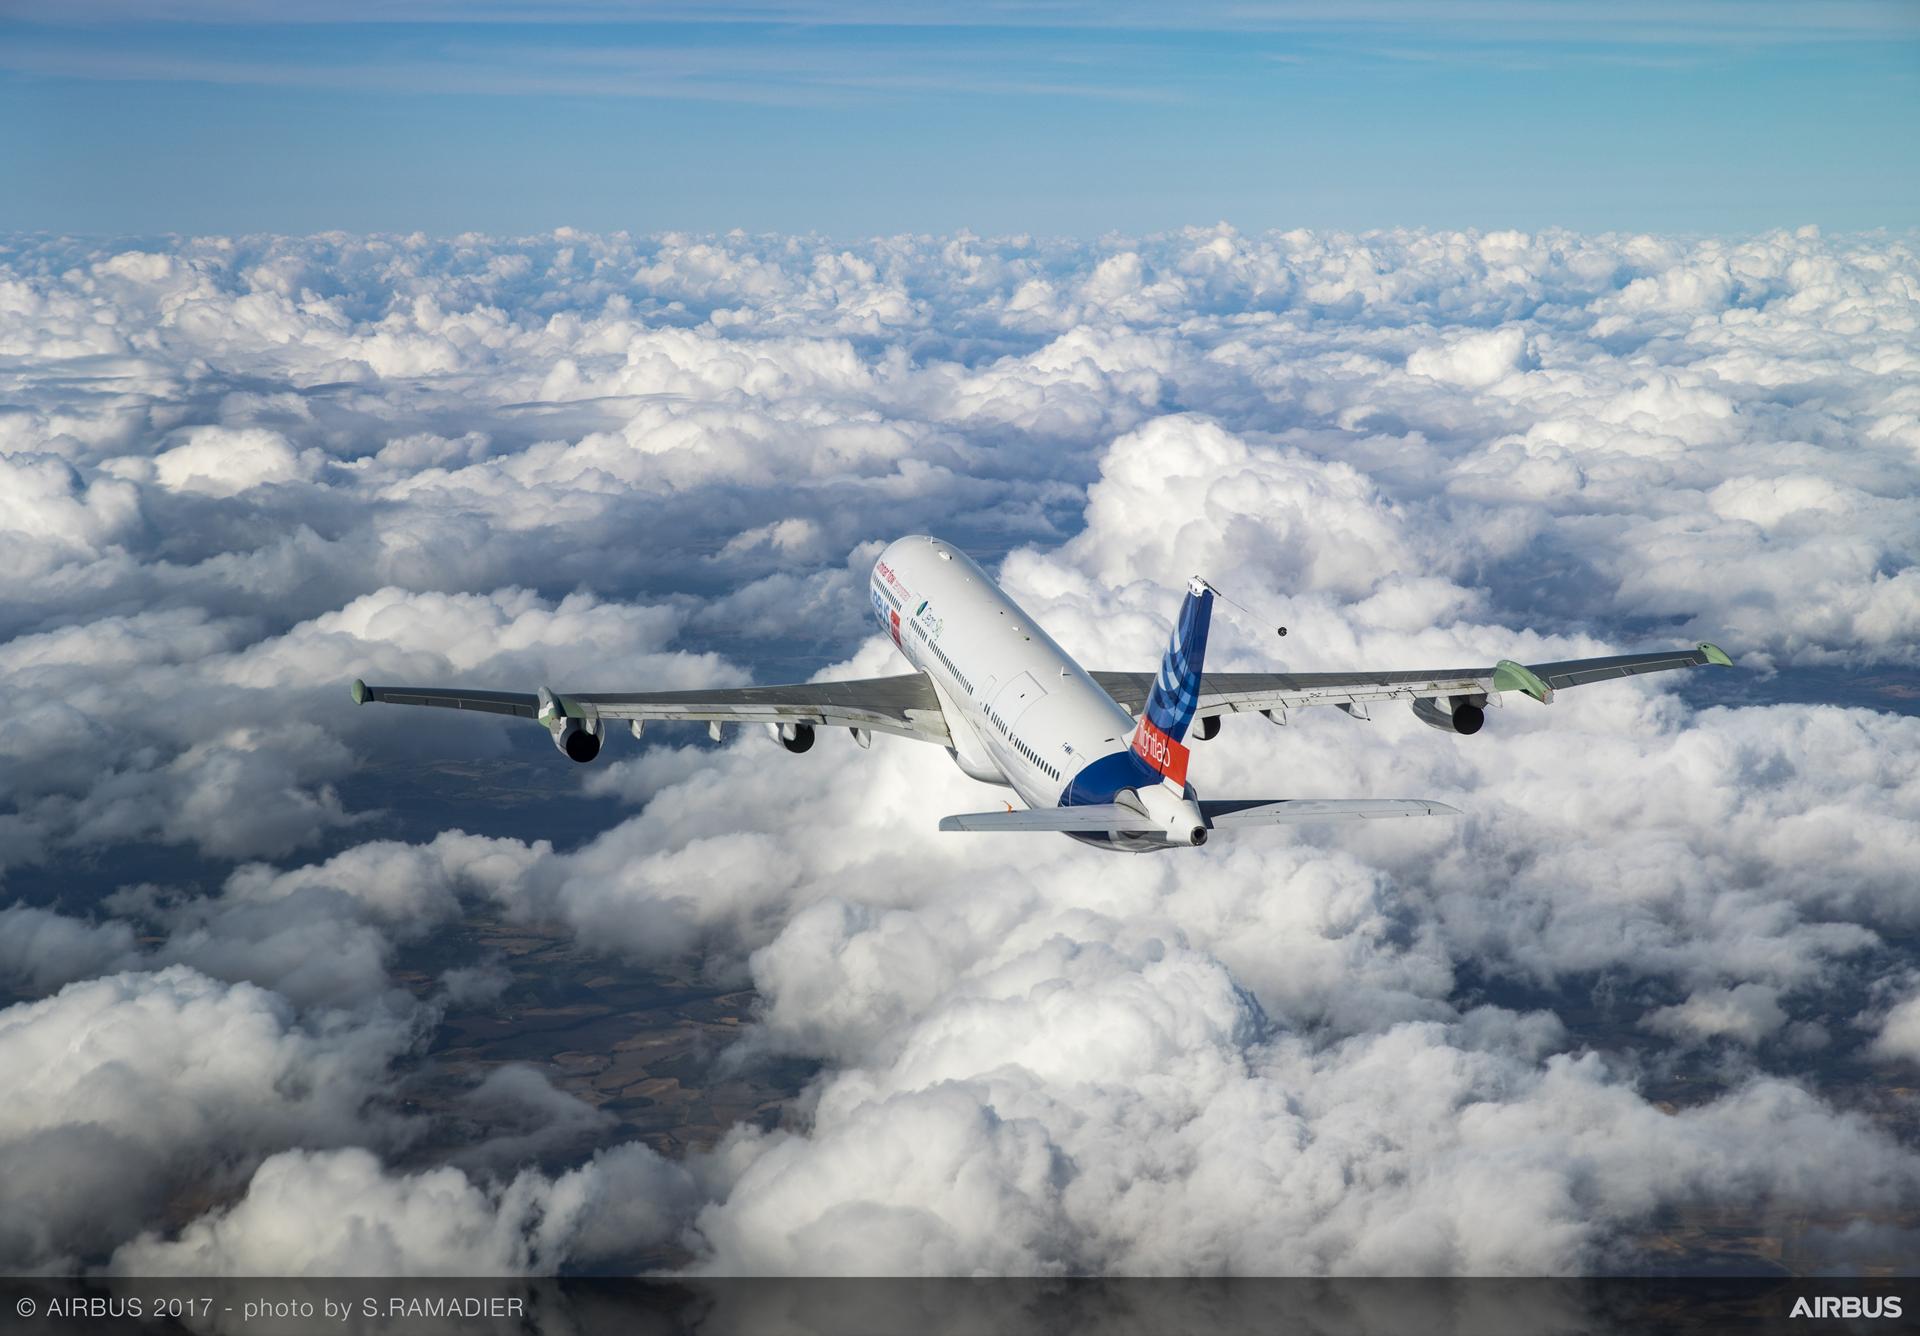 Foto A-340 programma BLADE Credits: Airbus (S. Ramadier)